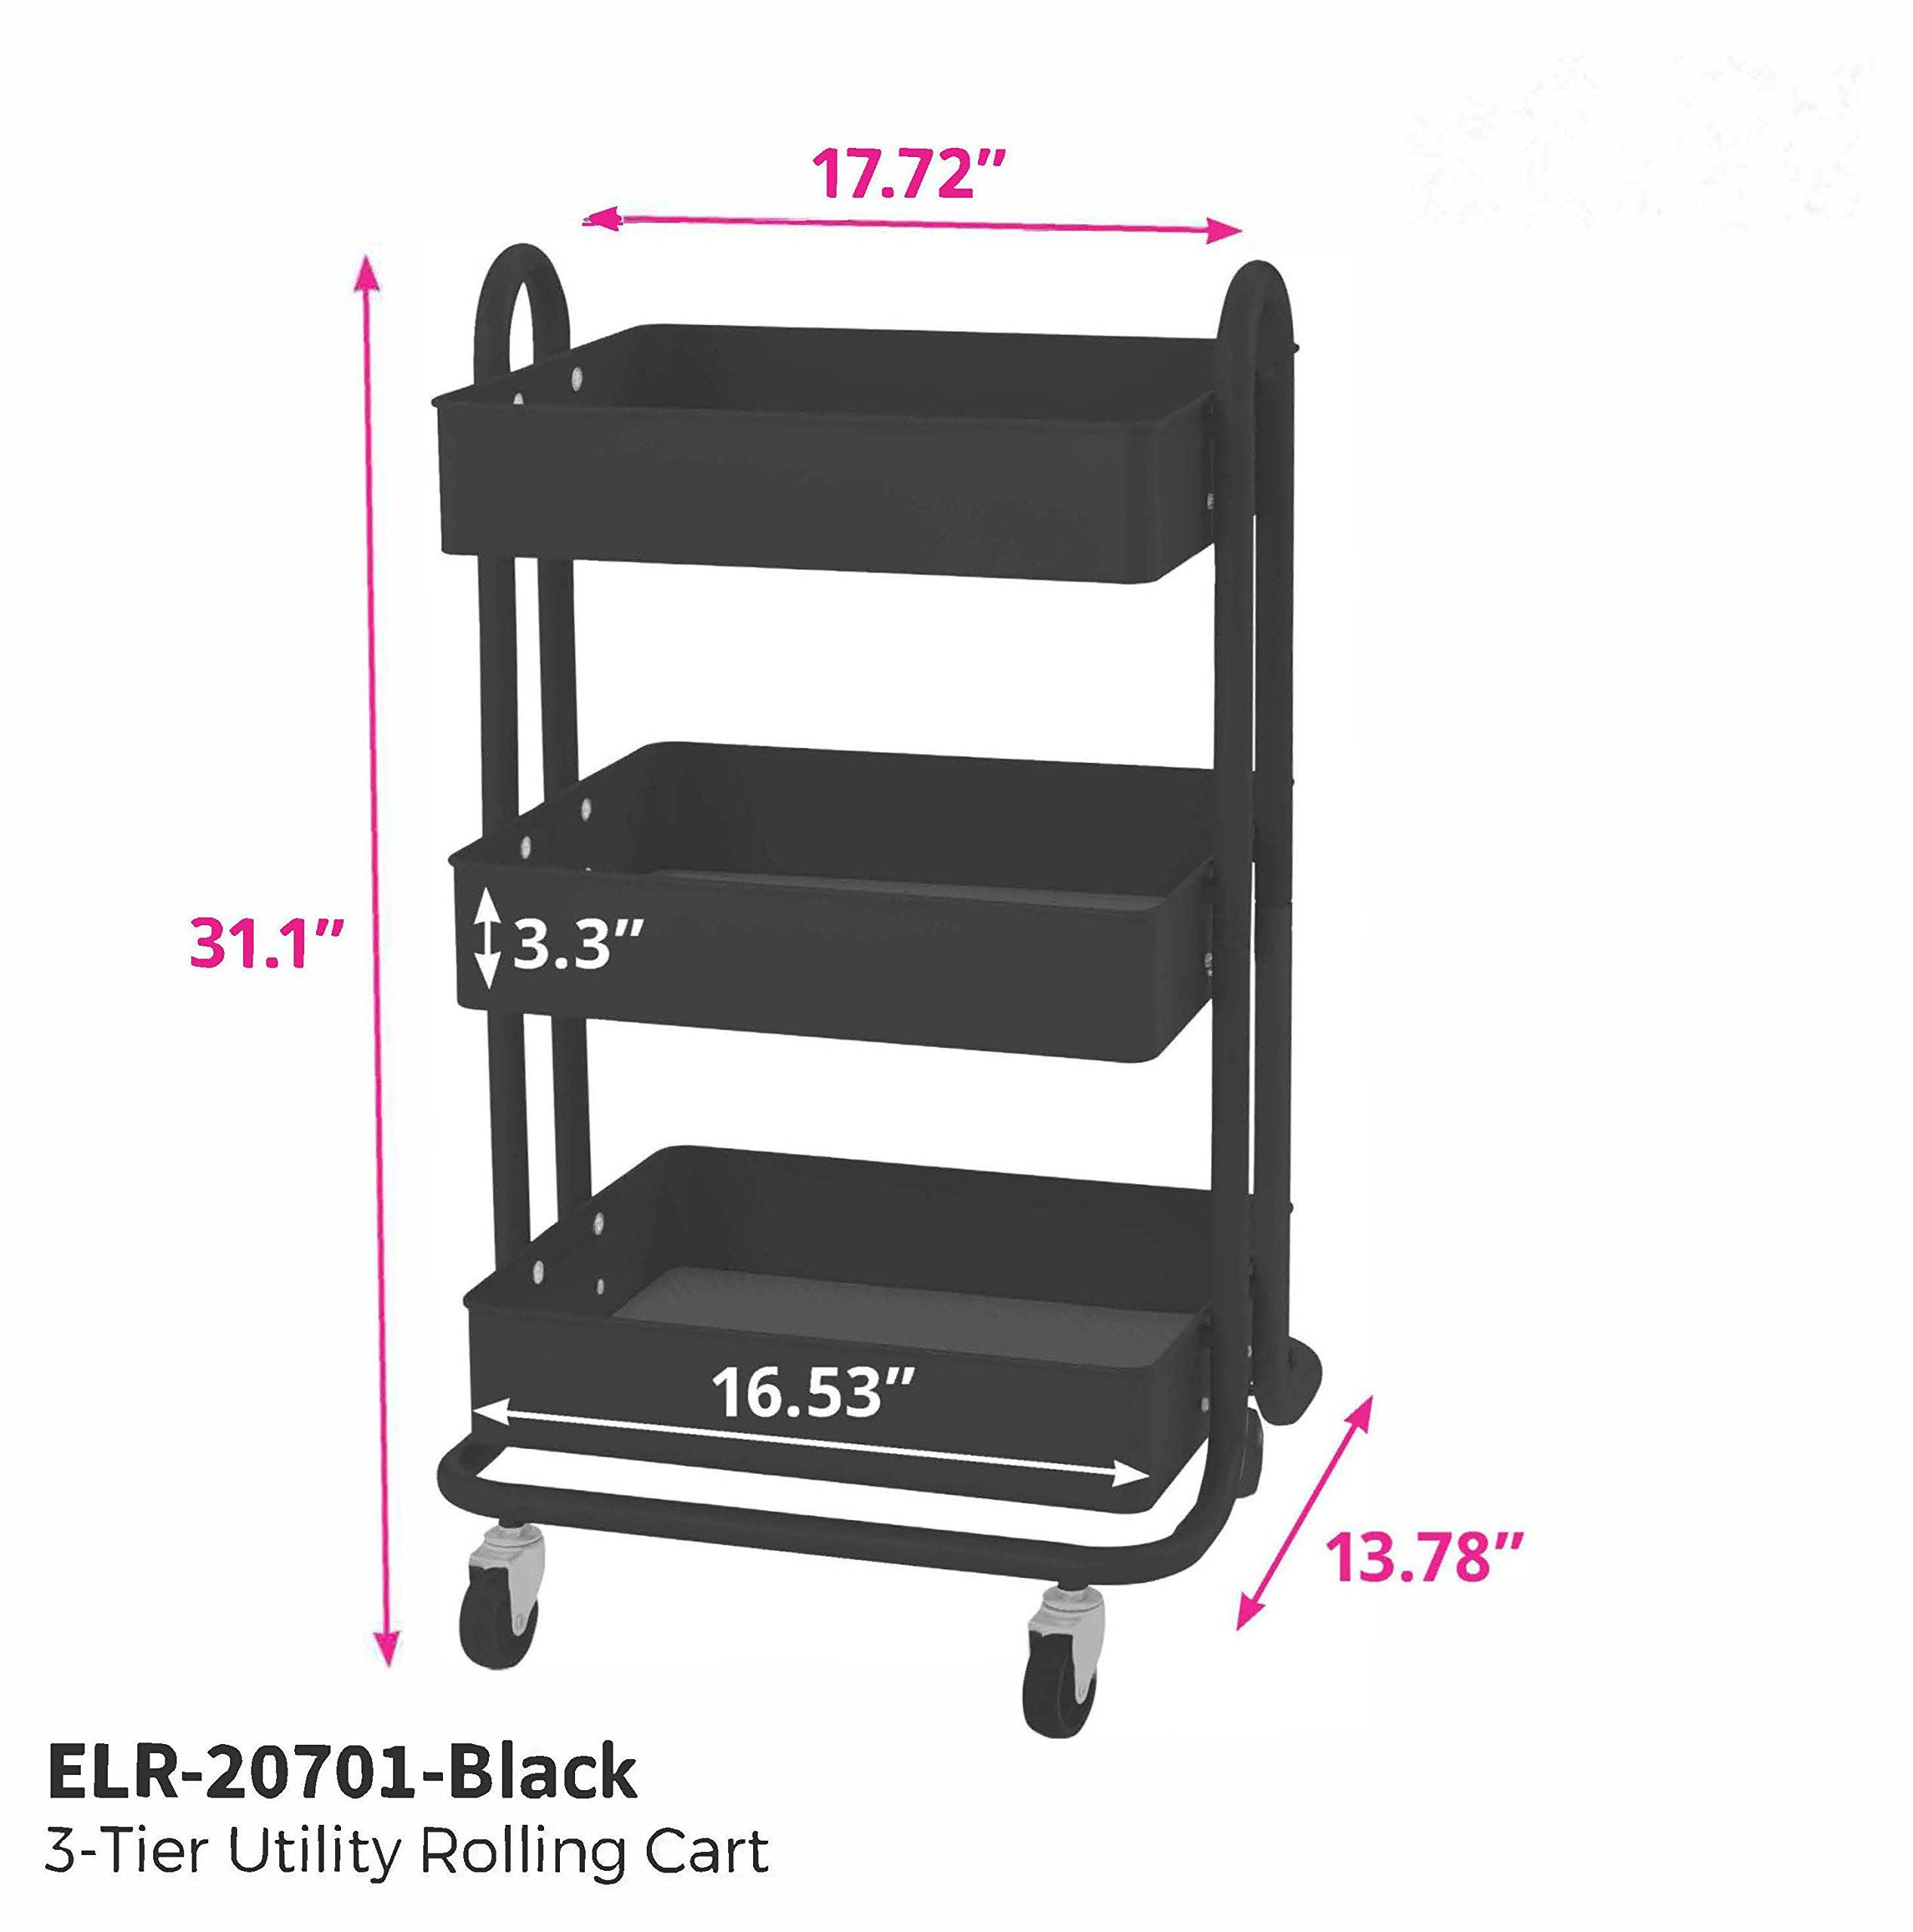 ECR4Kids 3-Tier Metal Rolling Utility Cart - Heavy Duty Mobile Storage Organizer, Black by ECR4Kids (Image #7)